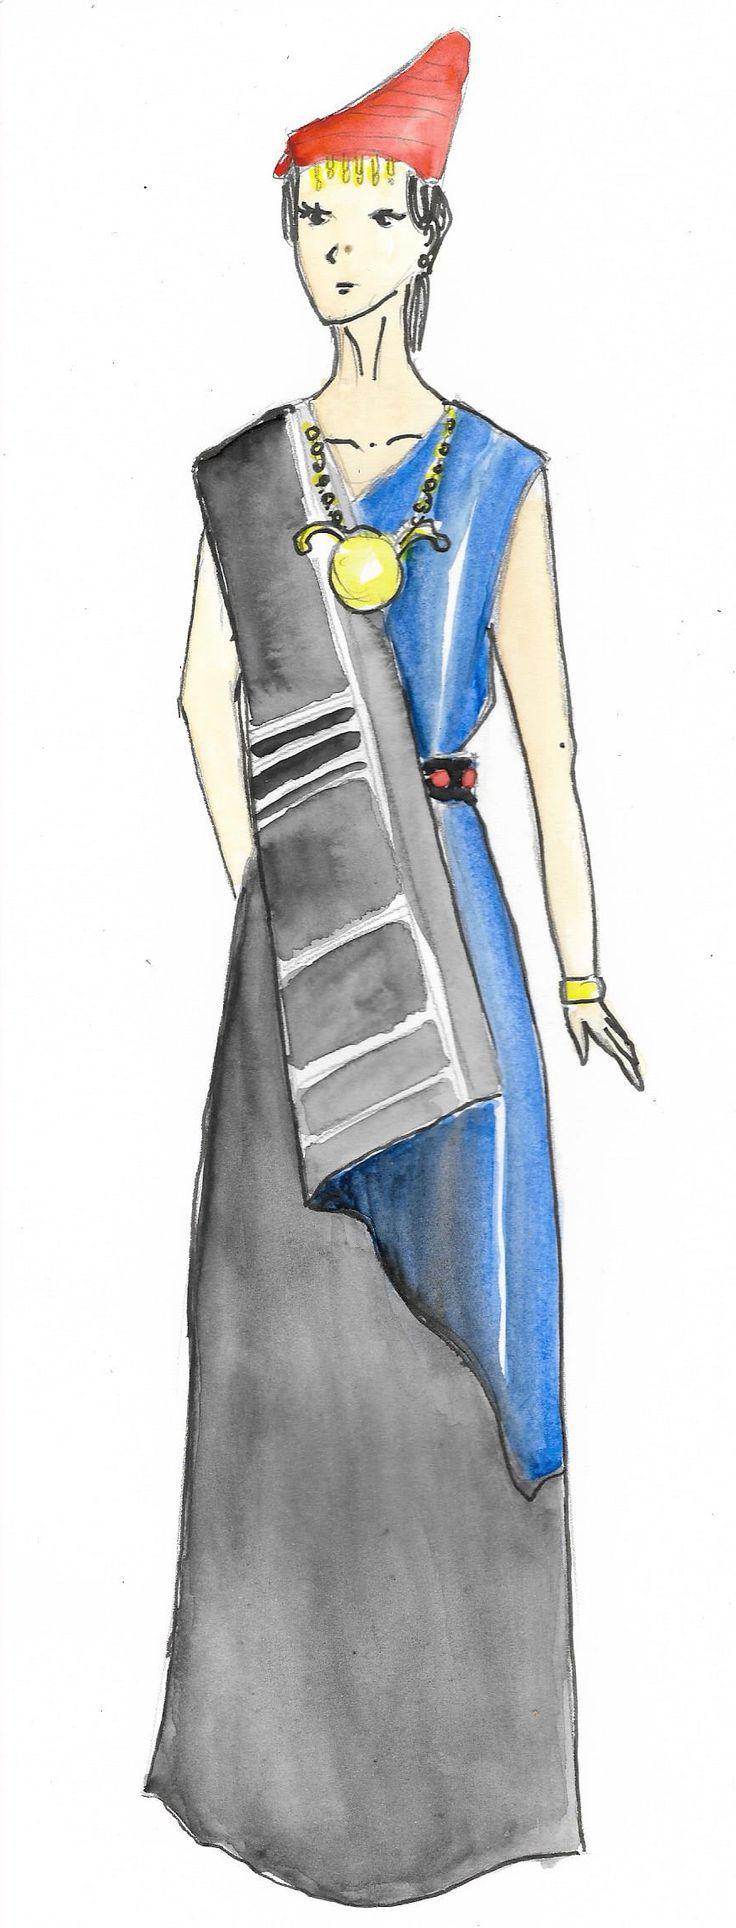 "Pakaian Tradisional dari Nusa Tenggara Barat, Indonesia.   Pakaian adat wanita suku Sasak disebut lambung. Pakaian ini terbuat dari kain pelung. Bentuk kerahnya menyerupai huruf ""V"". Di bahu kanannya terdapat songket. Coraknya senada dengan ikat pinggang yang disebut anteng. Aksesori yang dipakai adalah gelang, gelang kaki perak, kalung emas, ikat kepala dan anting-anting bulat."